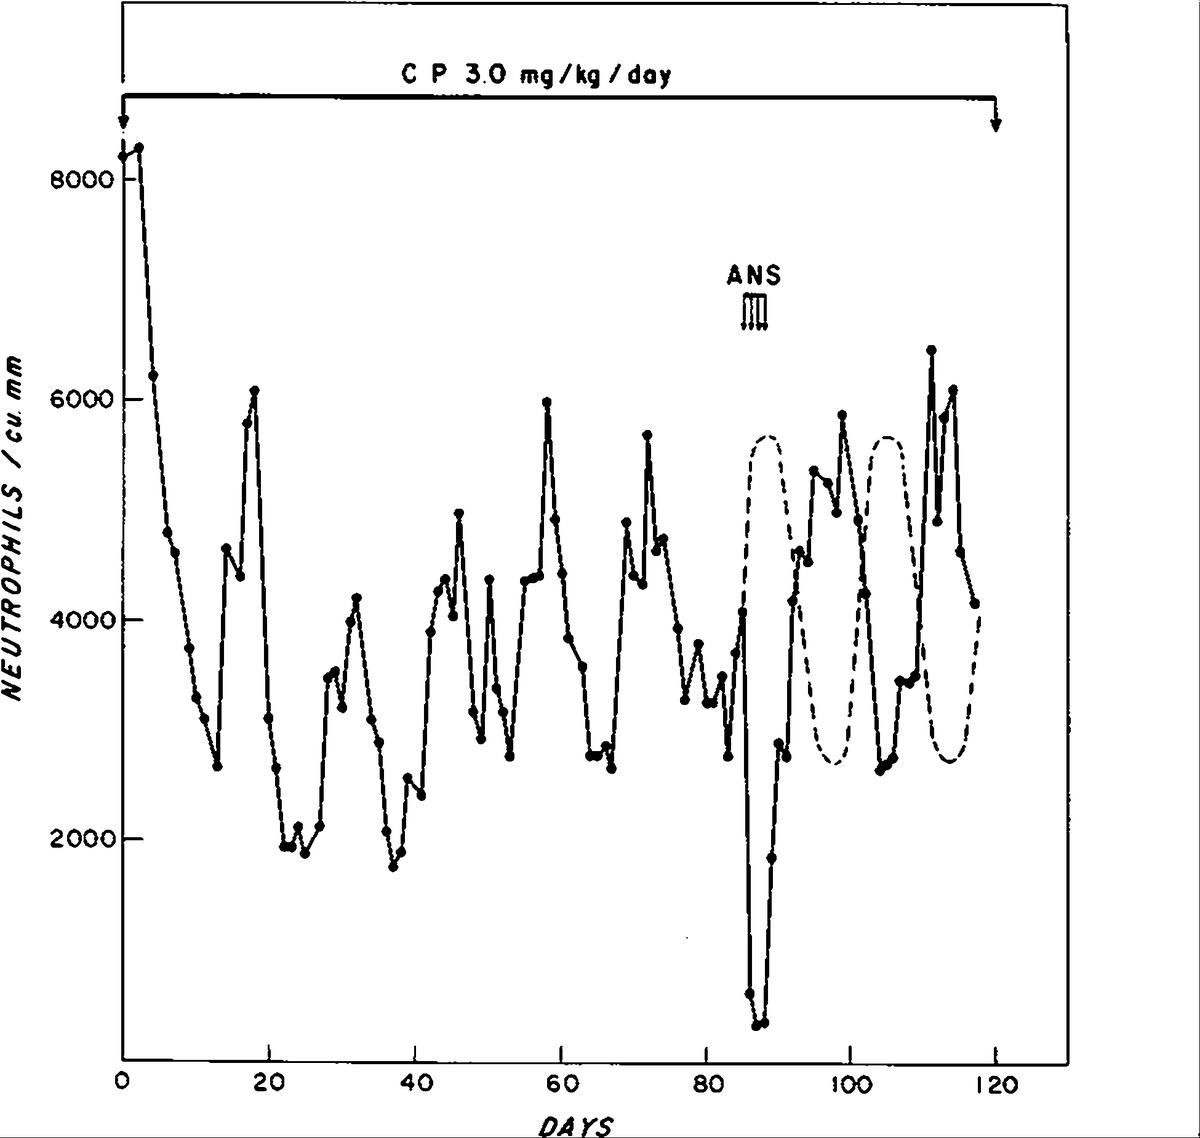 Cyclophosphamide Induced Cyclical Neutropenia